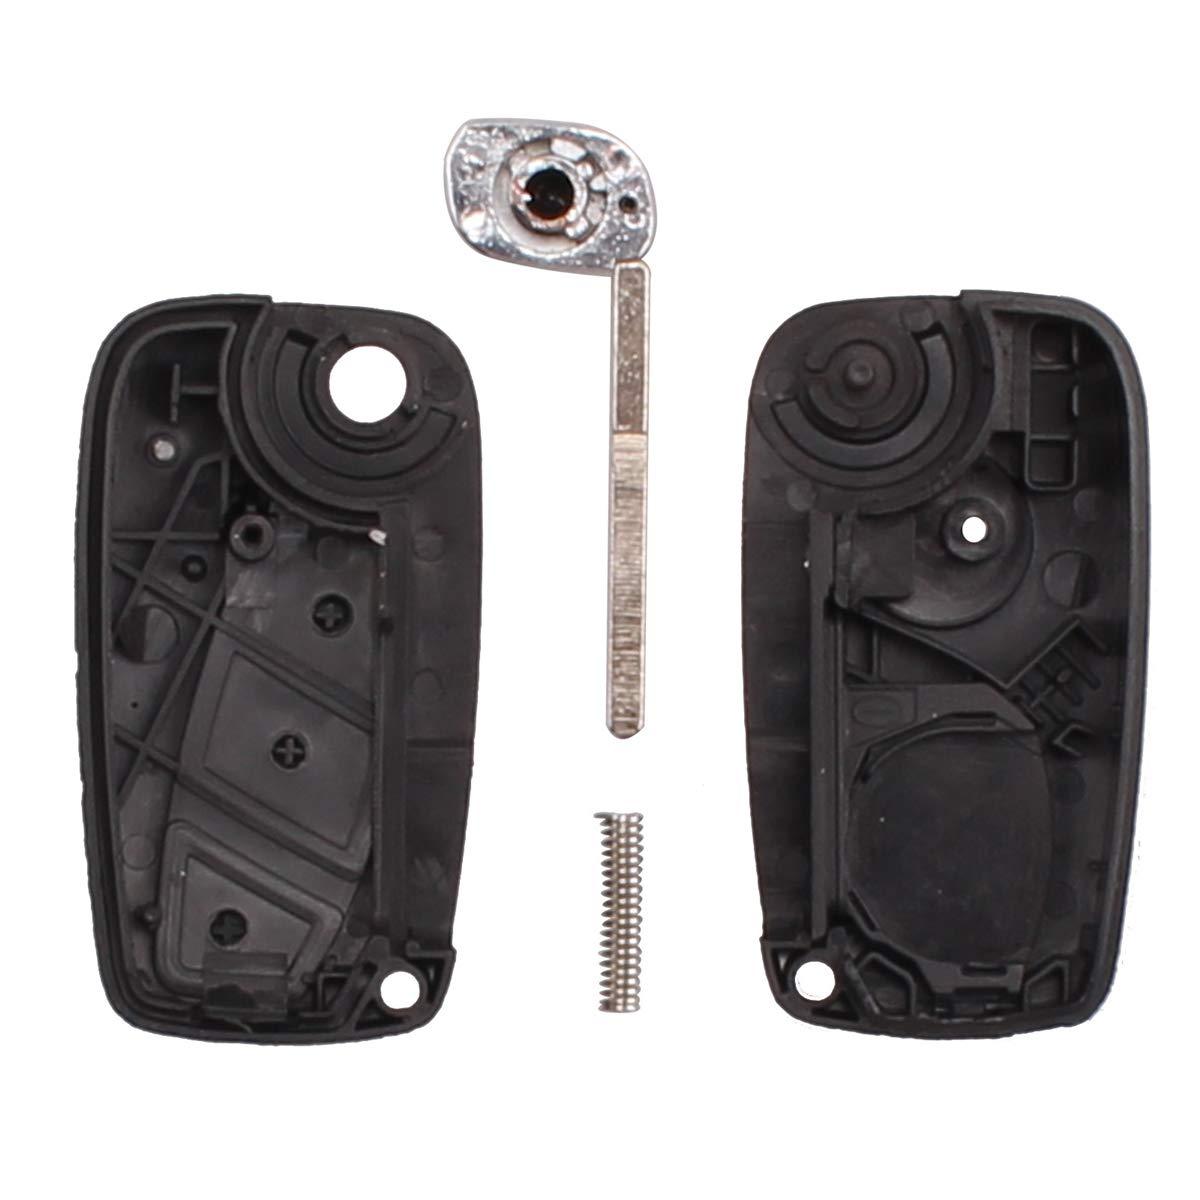 Heart Horse Flip Folding Remote 3 Buttons Car Cover Key Fob Key Case Compatible with Fiat Punto Ducato Stilo Panda Idea Doblo Bravo Blue